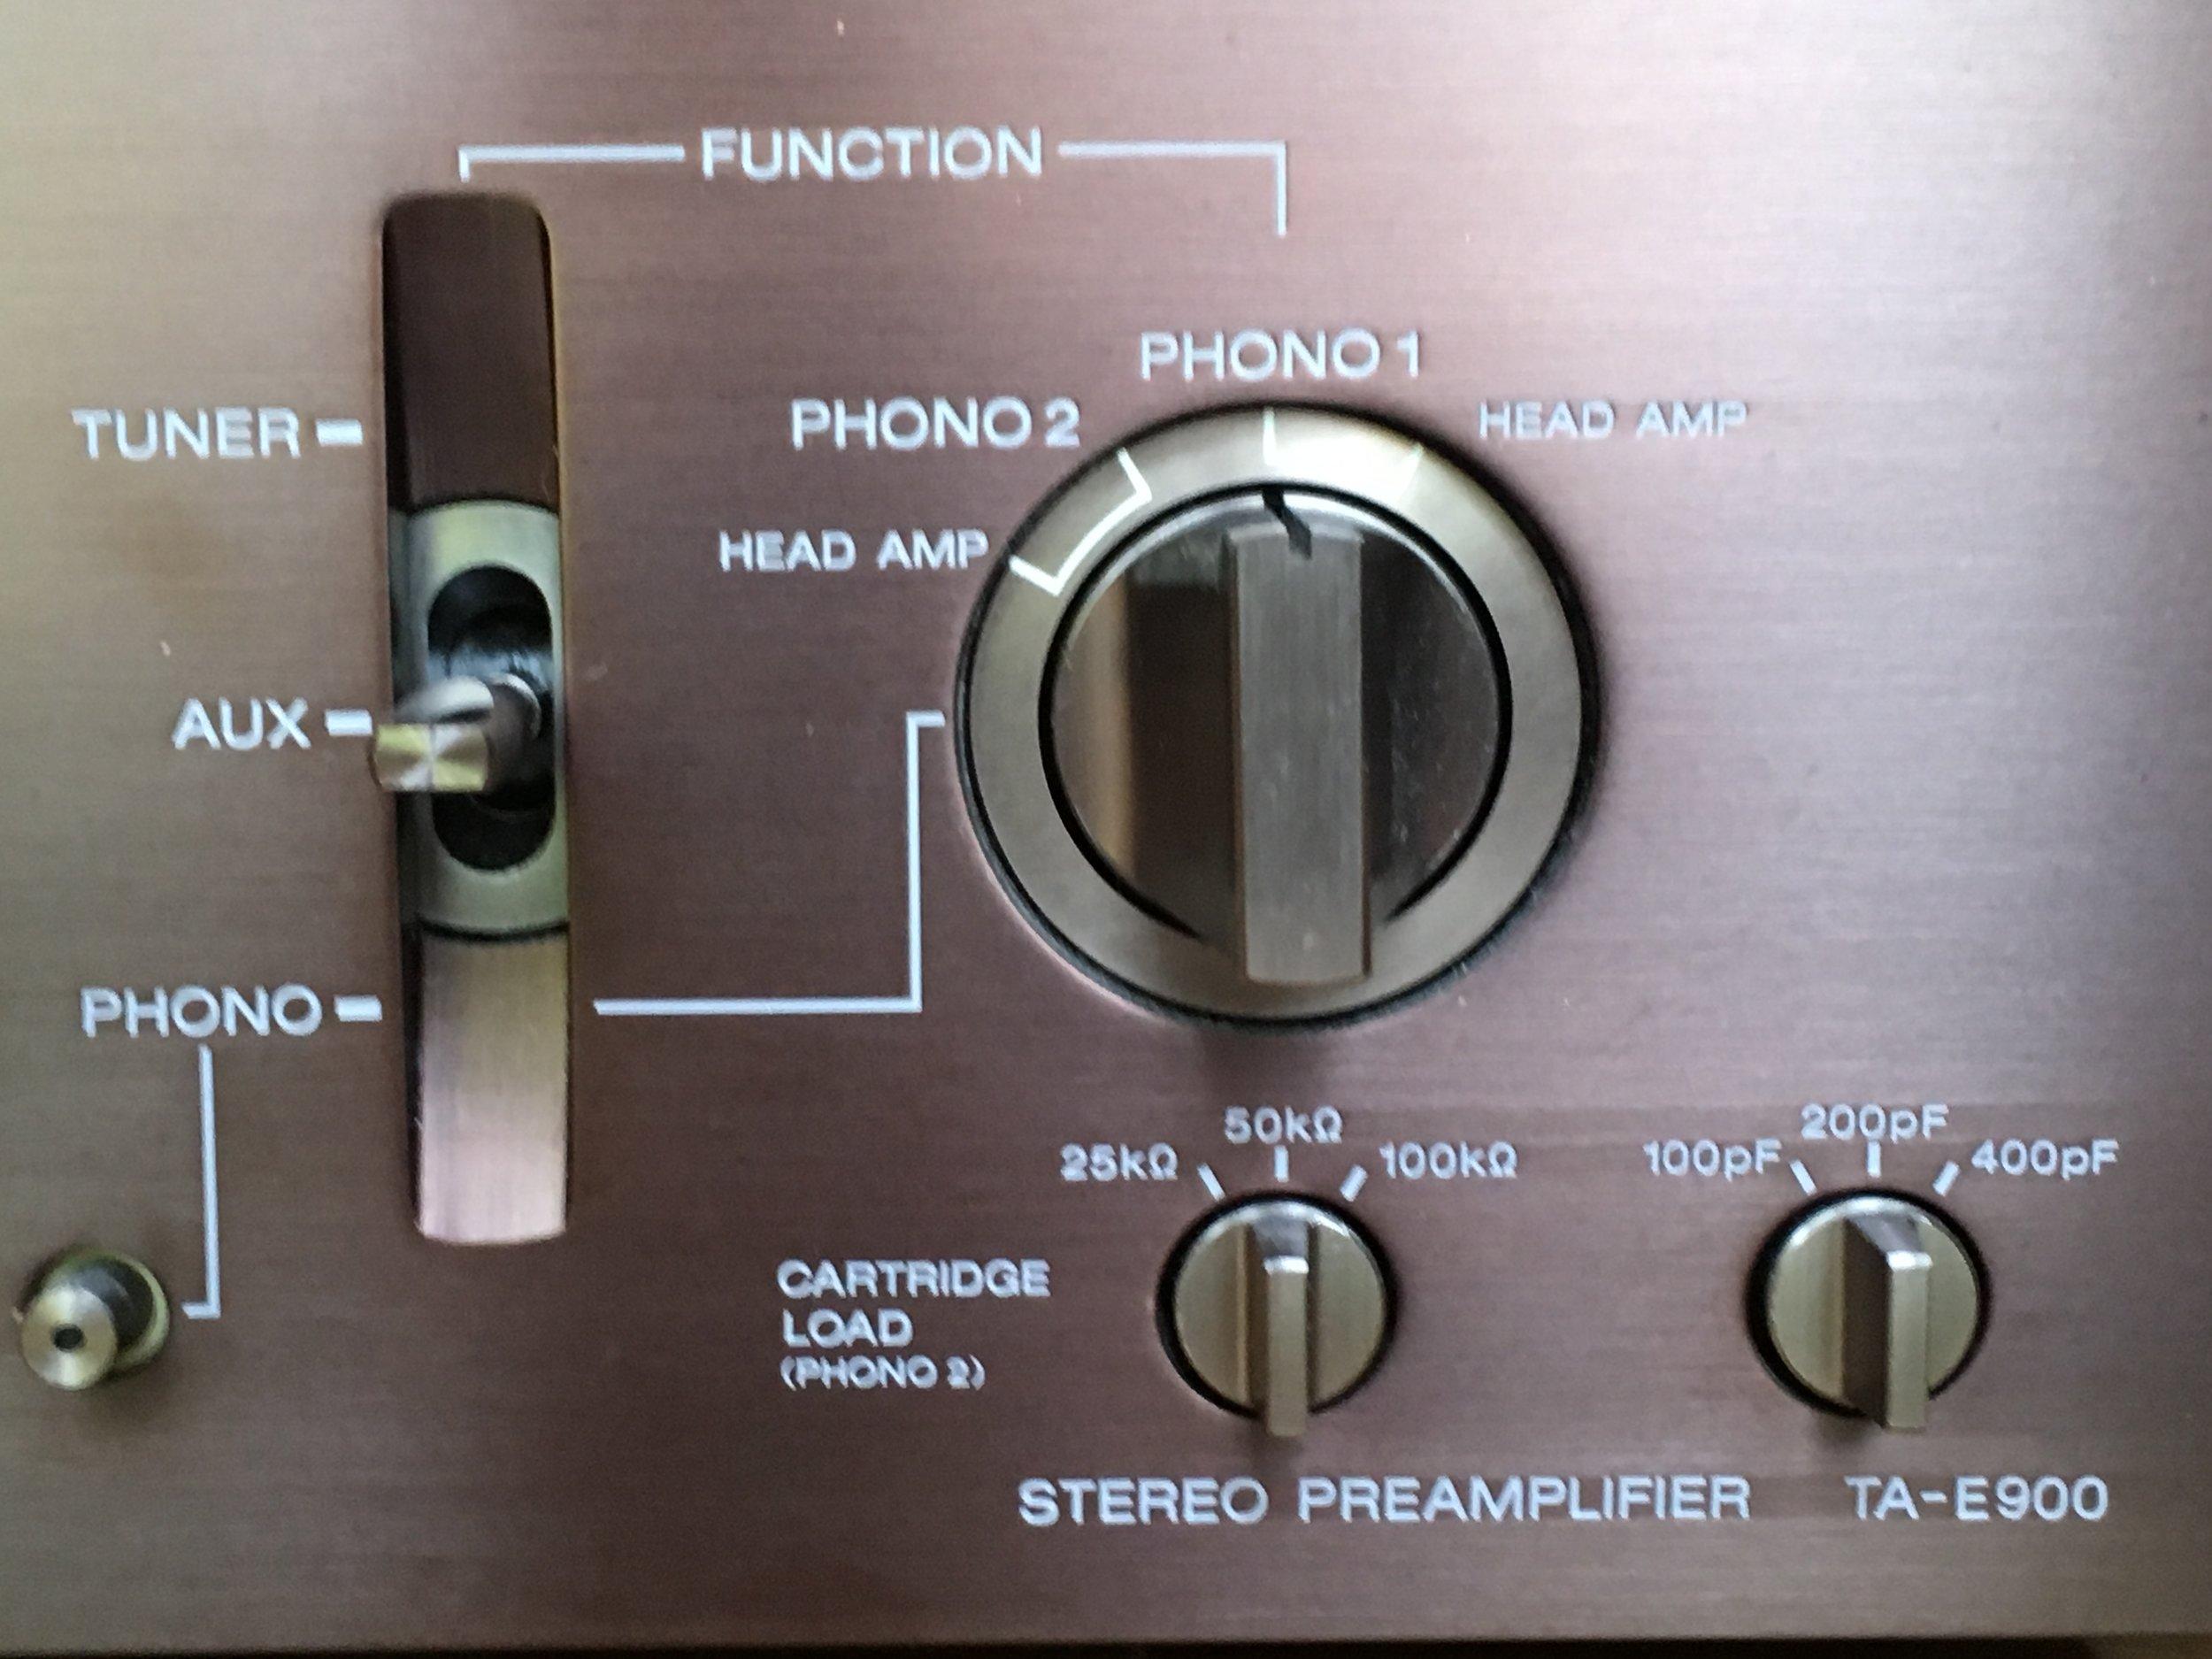 Sony_Espirit_amplifier_TA-E900